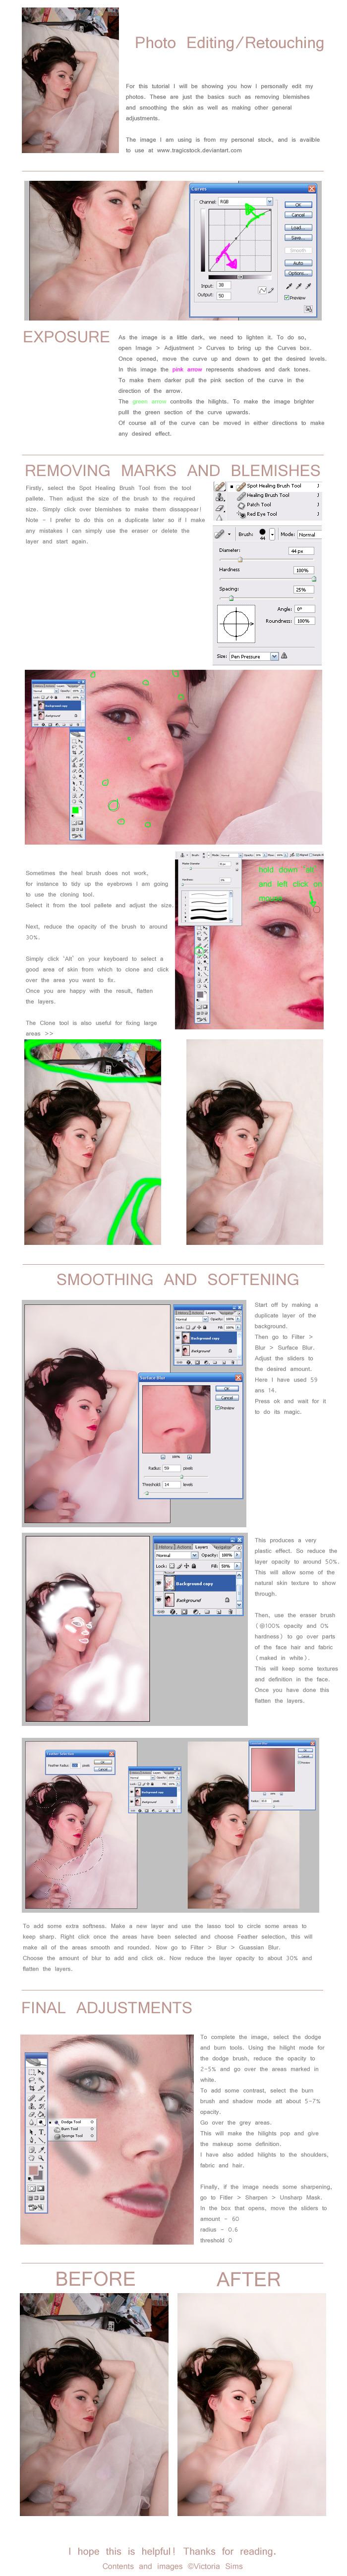 Basic Photo Editing Tutorial